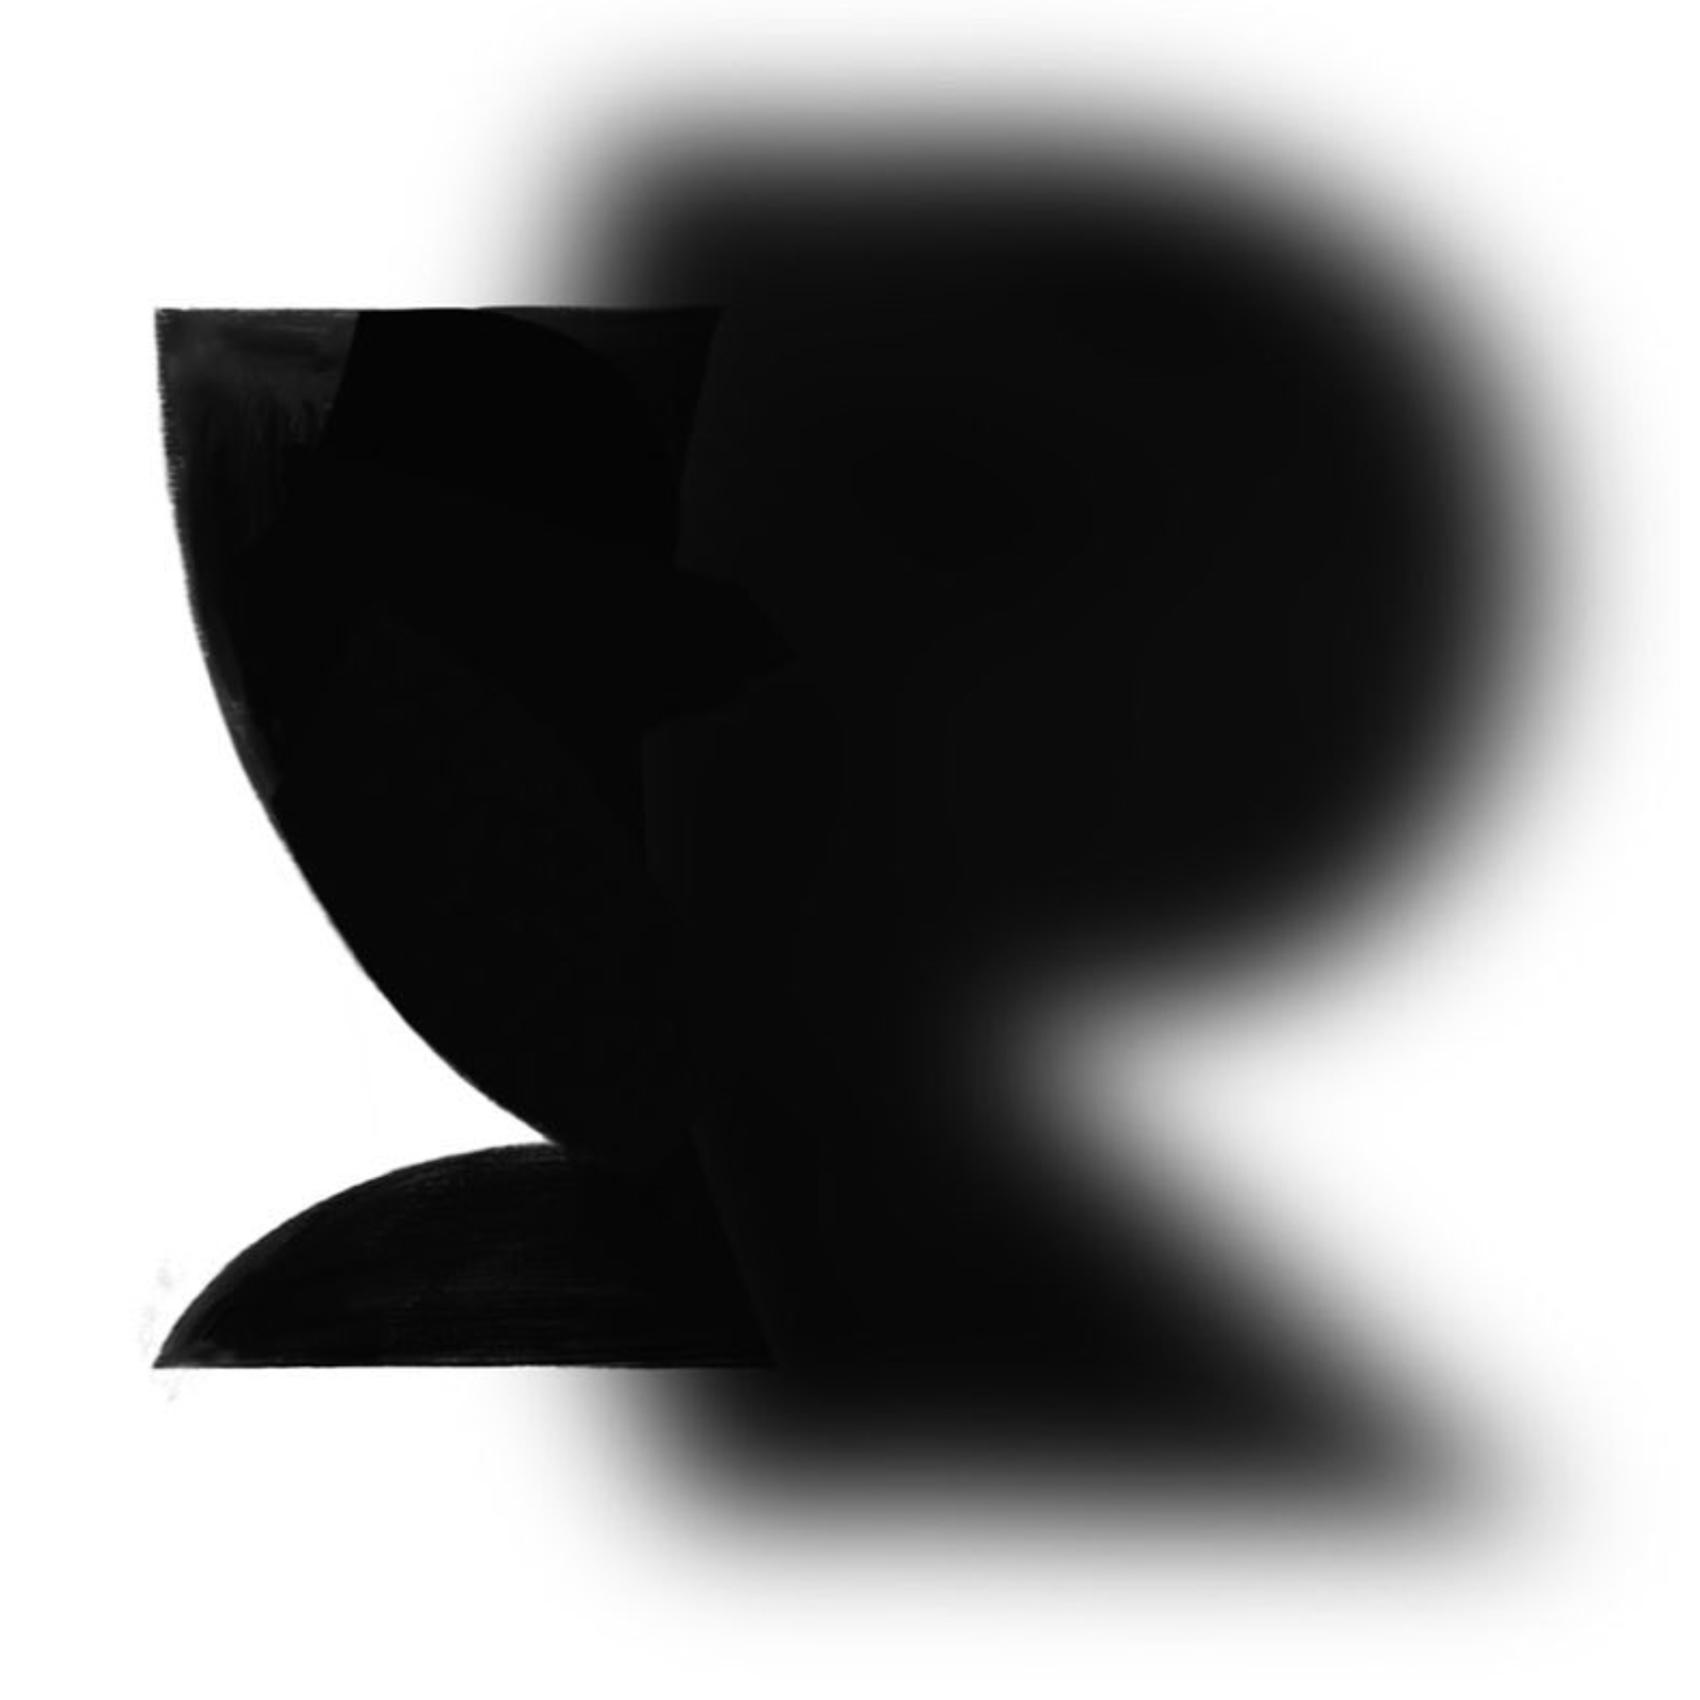 Experimental_3.jpg